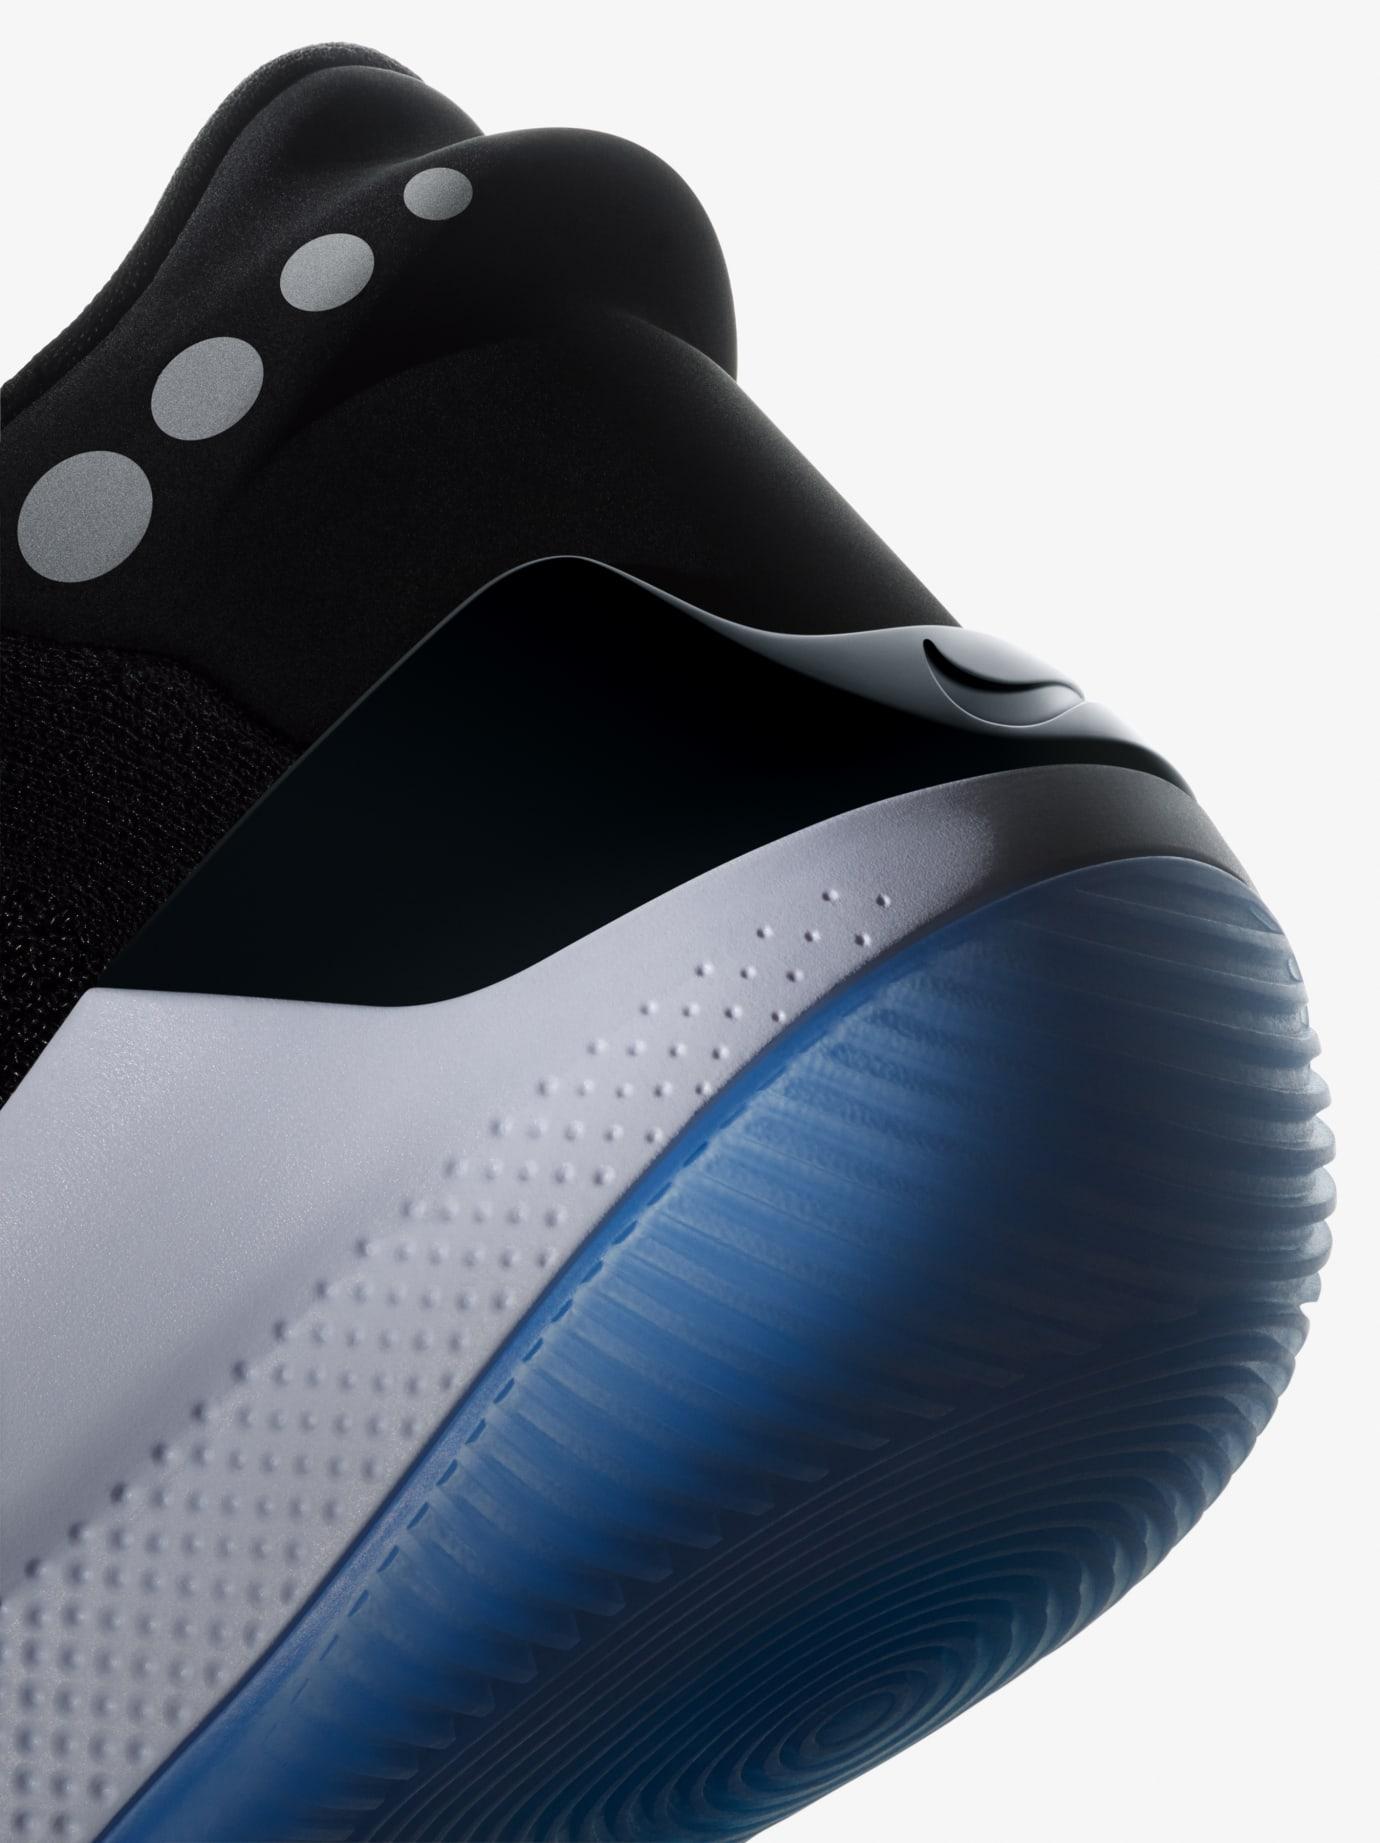 Nike Adapt BB 5